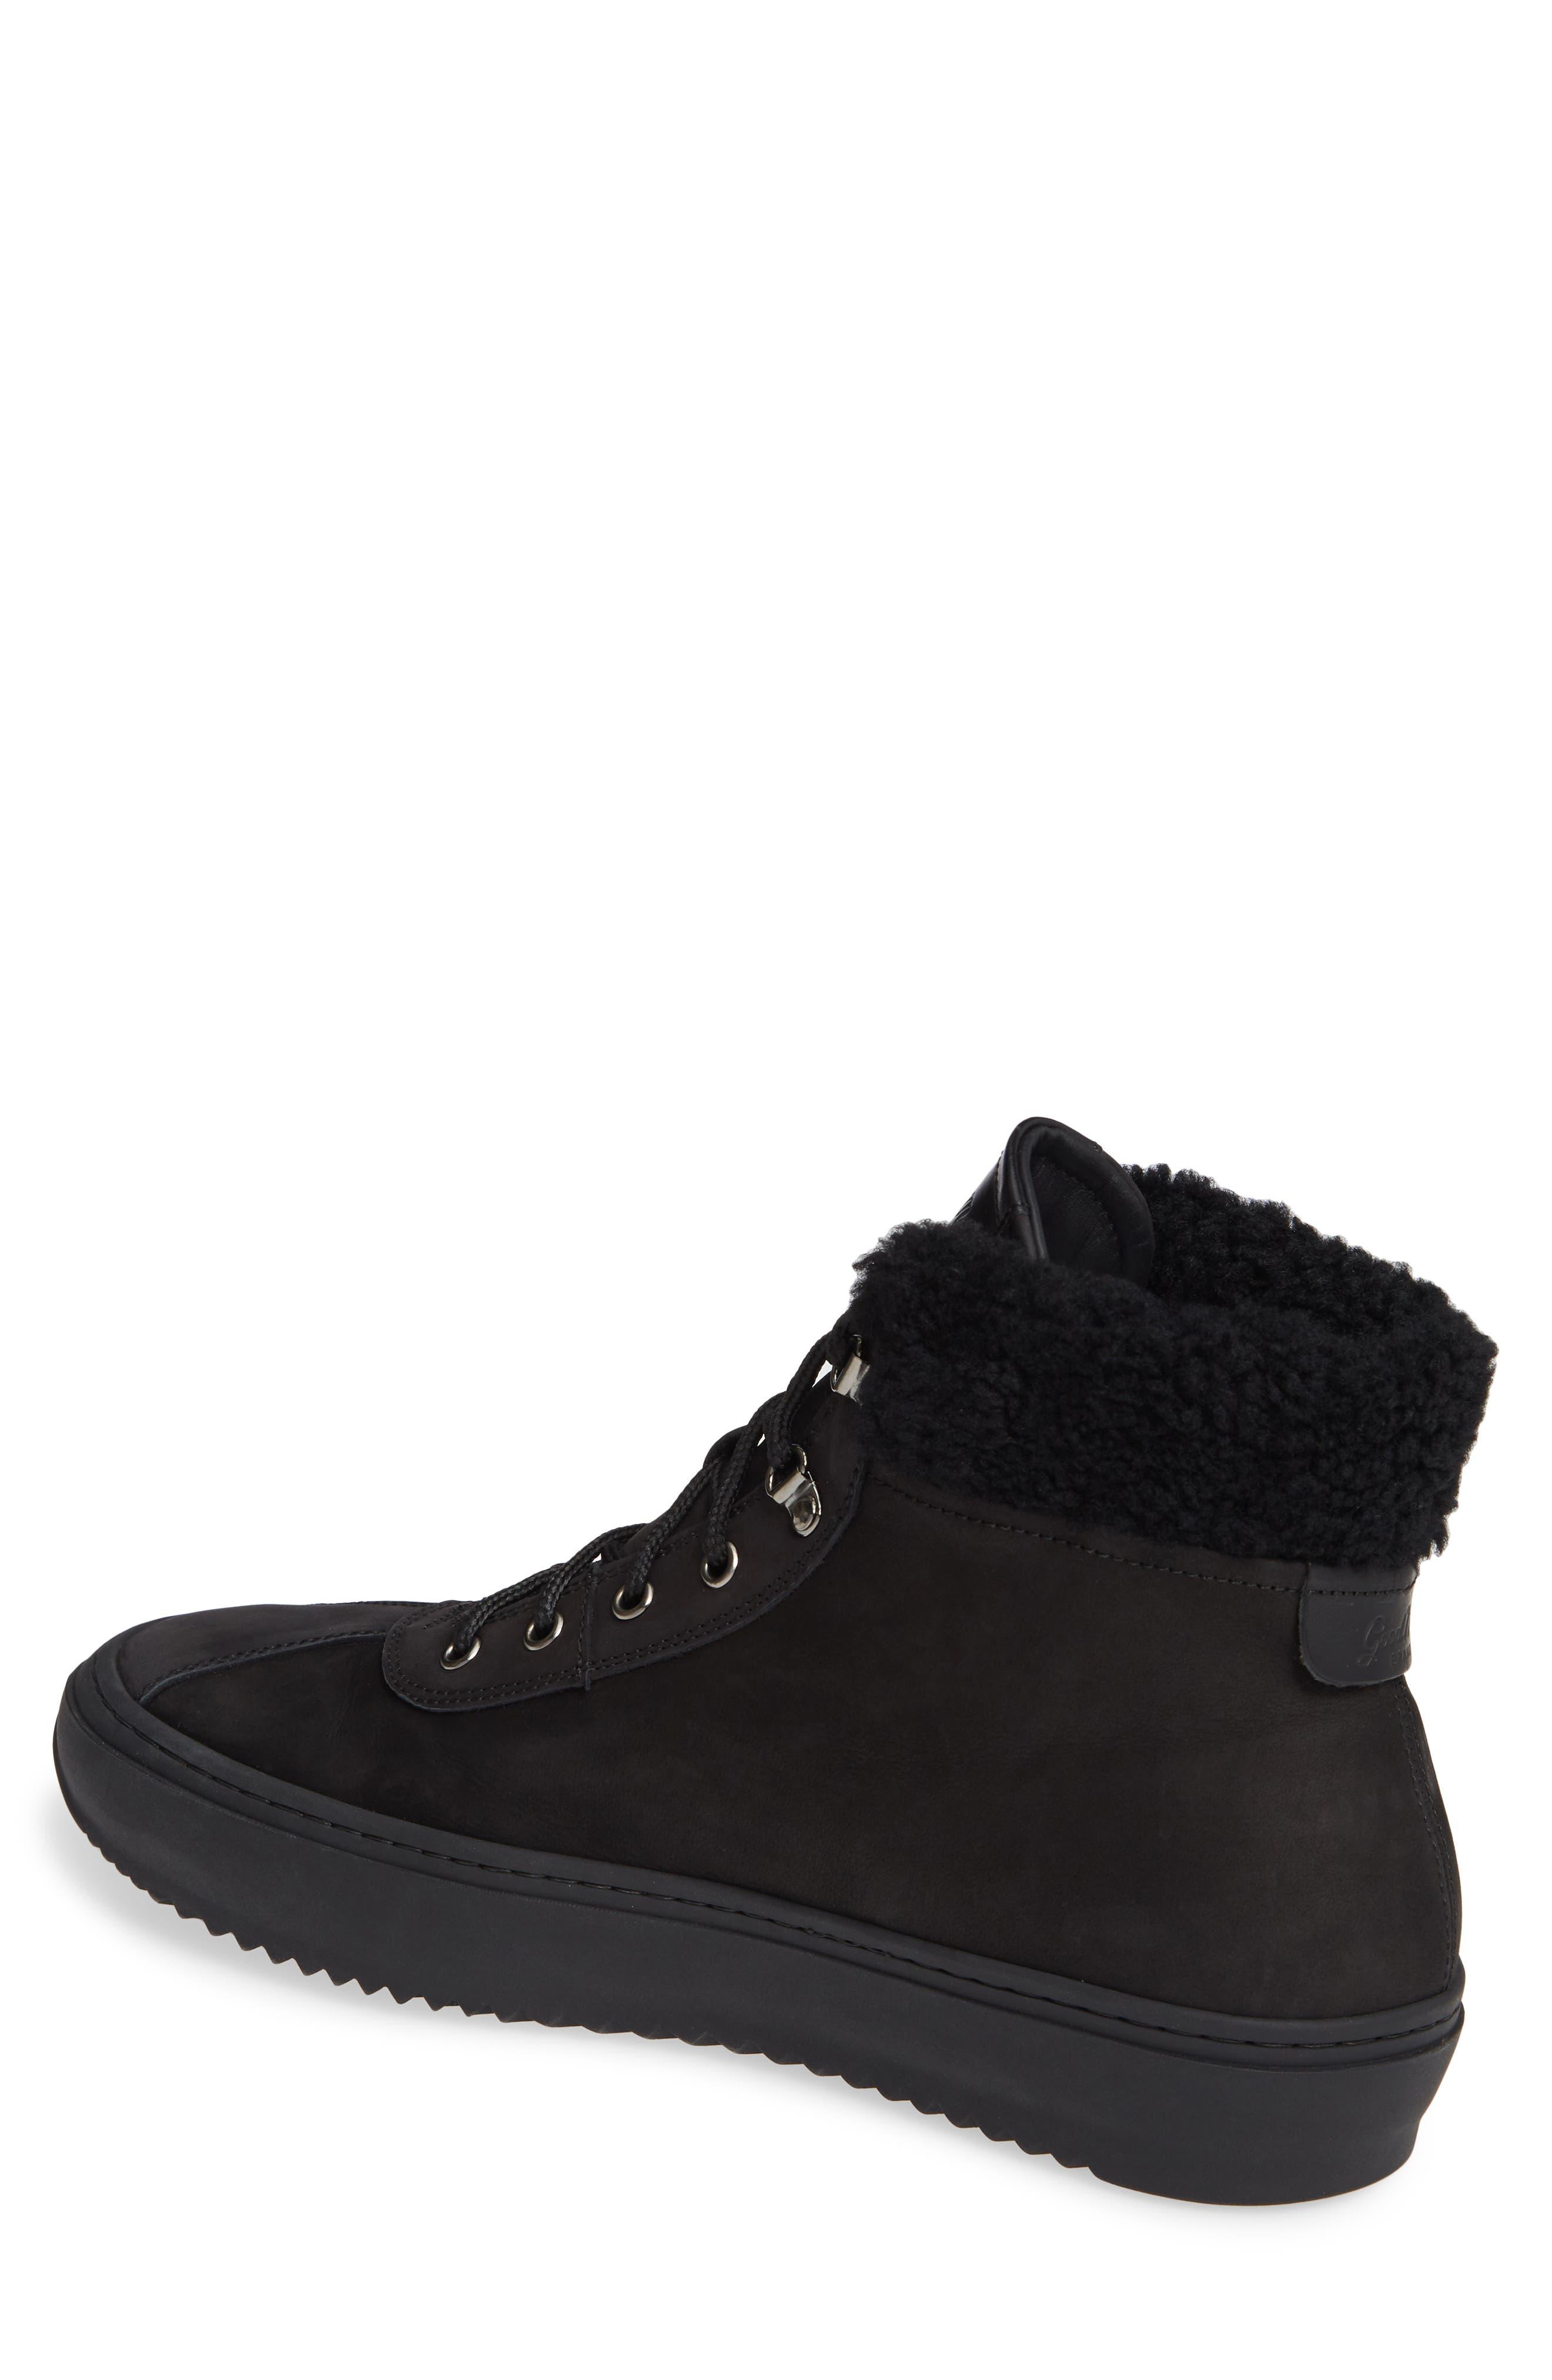 Hiker Street Sneaker,                             Alternate thumbnail 2, color,                             BLACK LEATHER